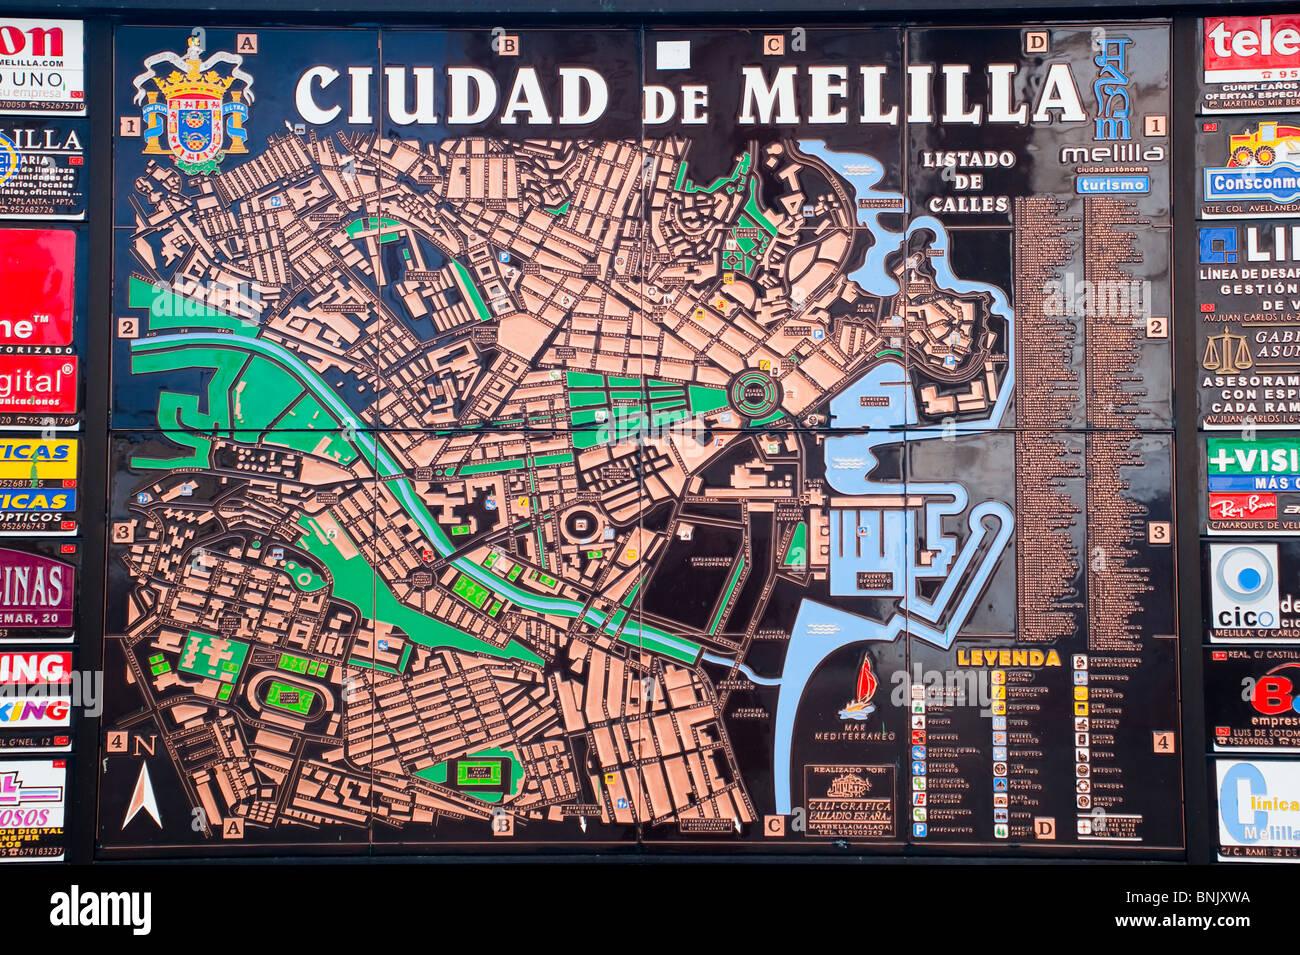 Melilla Spain Map.Melilla City Map Melilla Spain Europe Stock Photo 30534374 Alamy